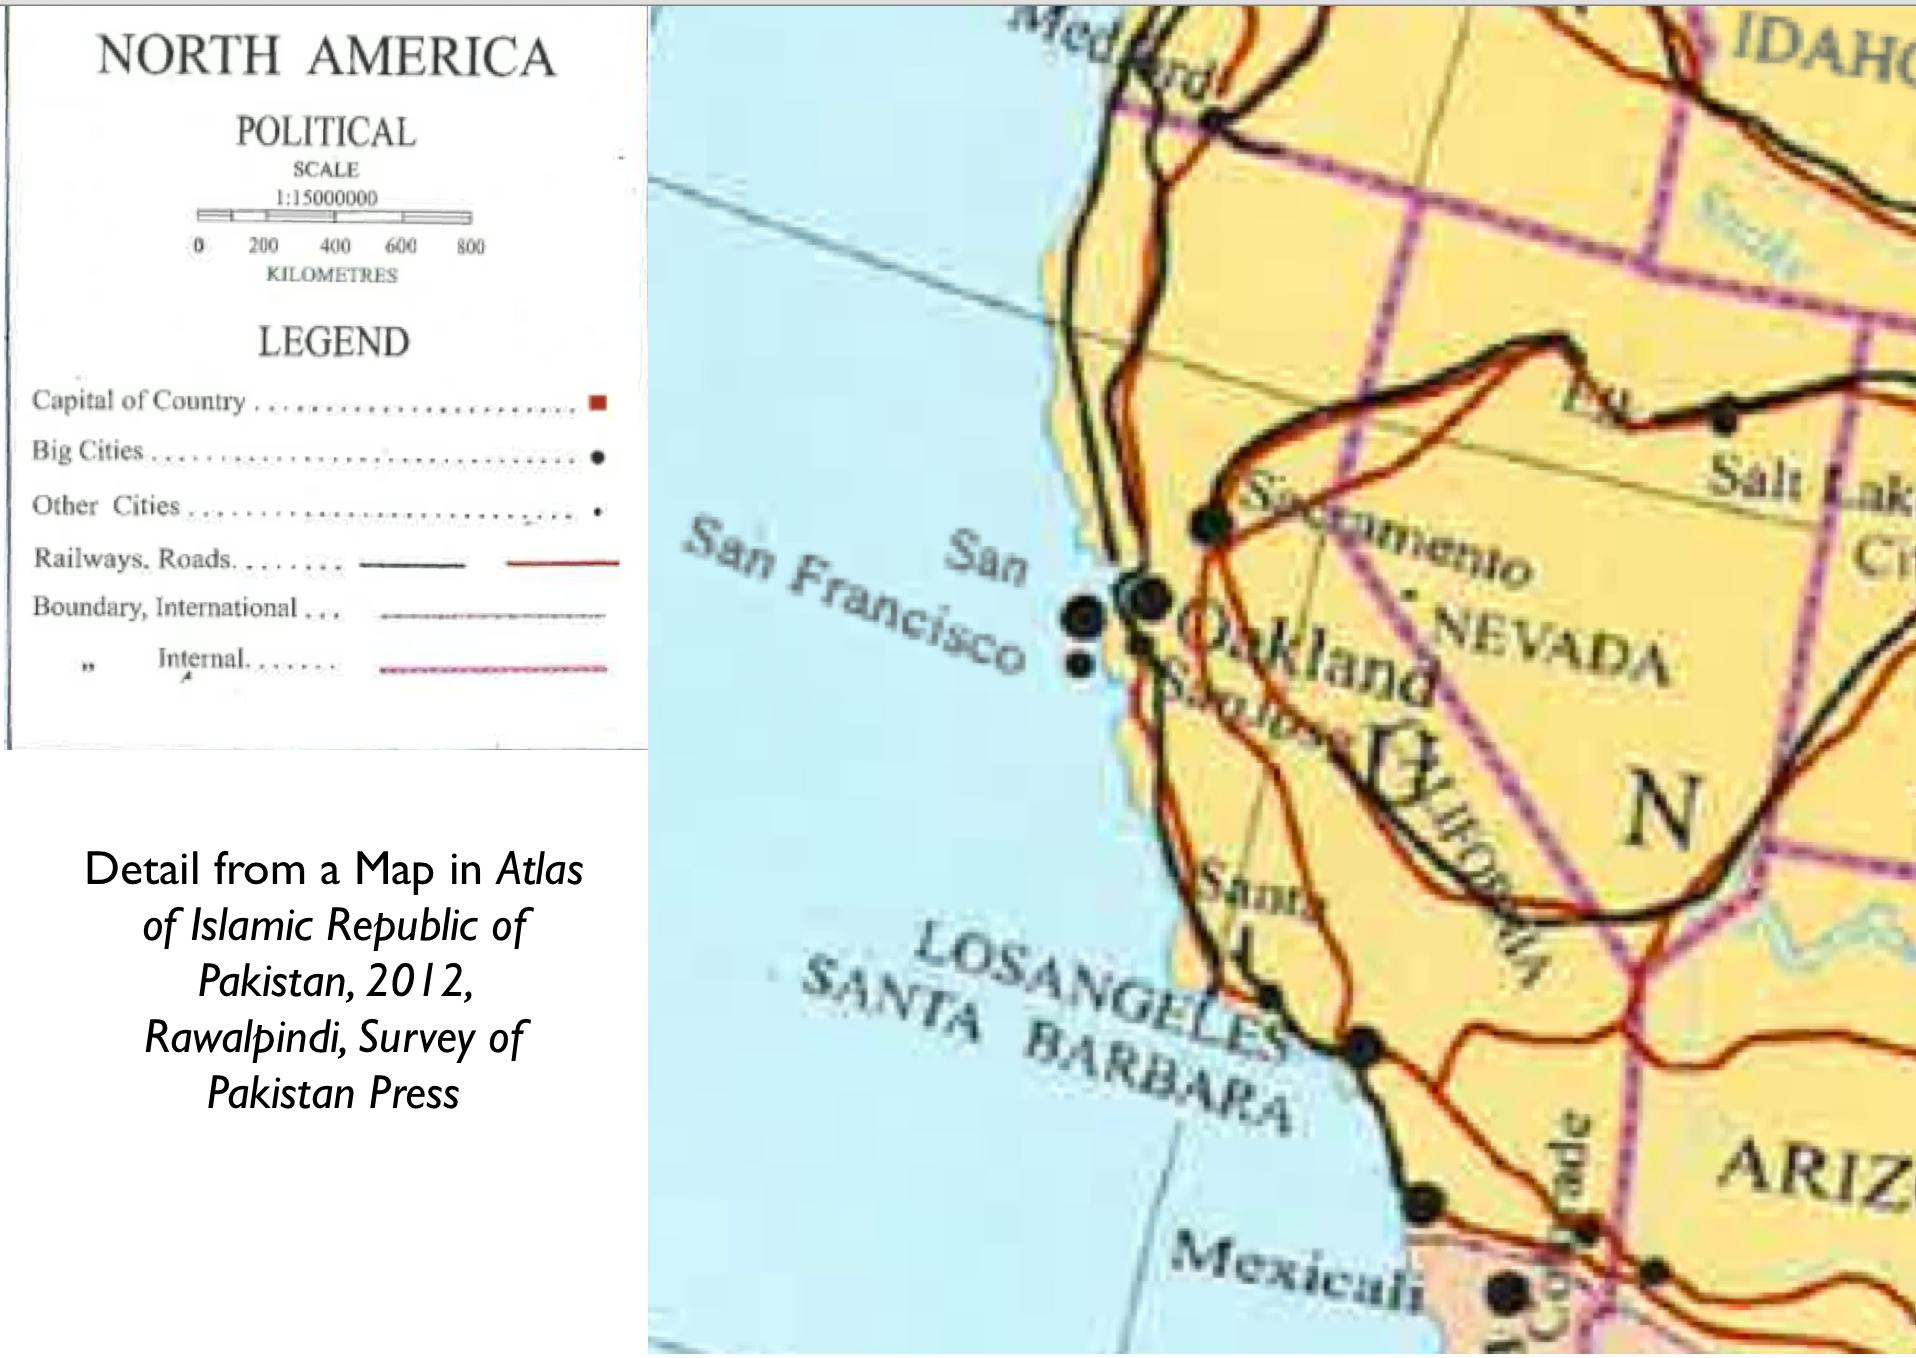 Map Of Charming California - Klipy - Charming California Map